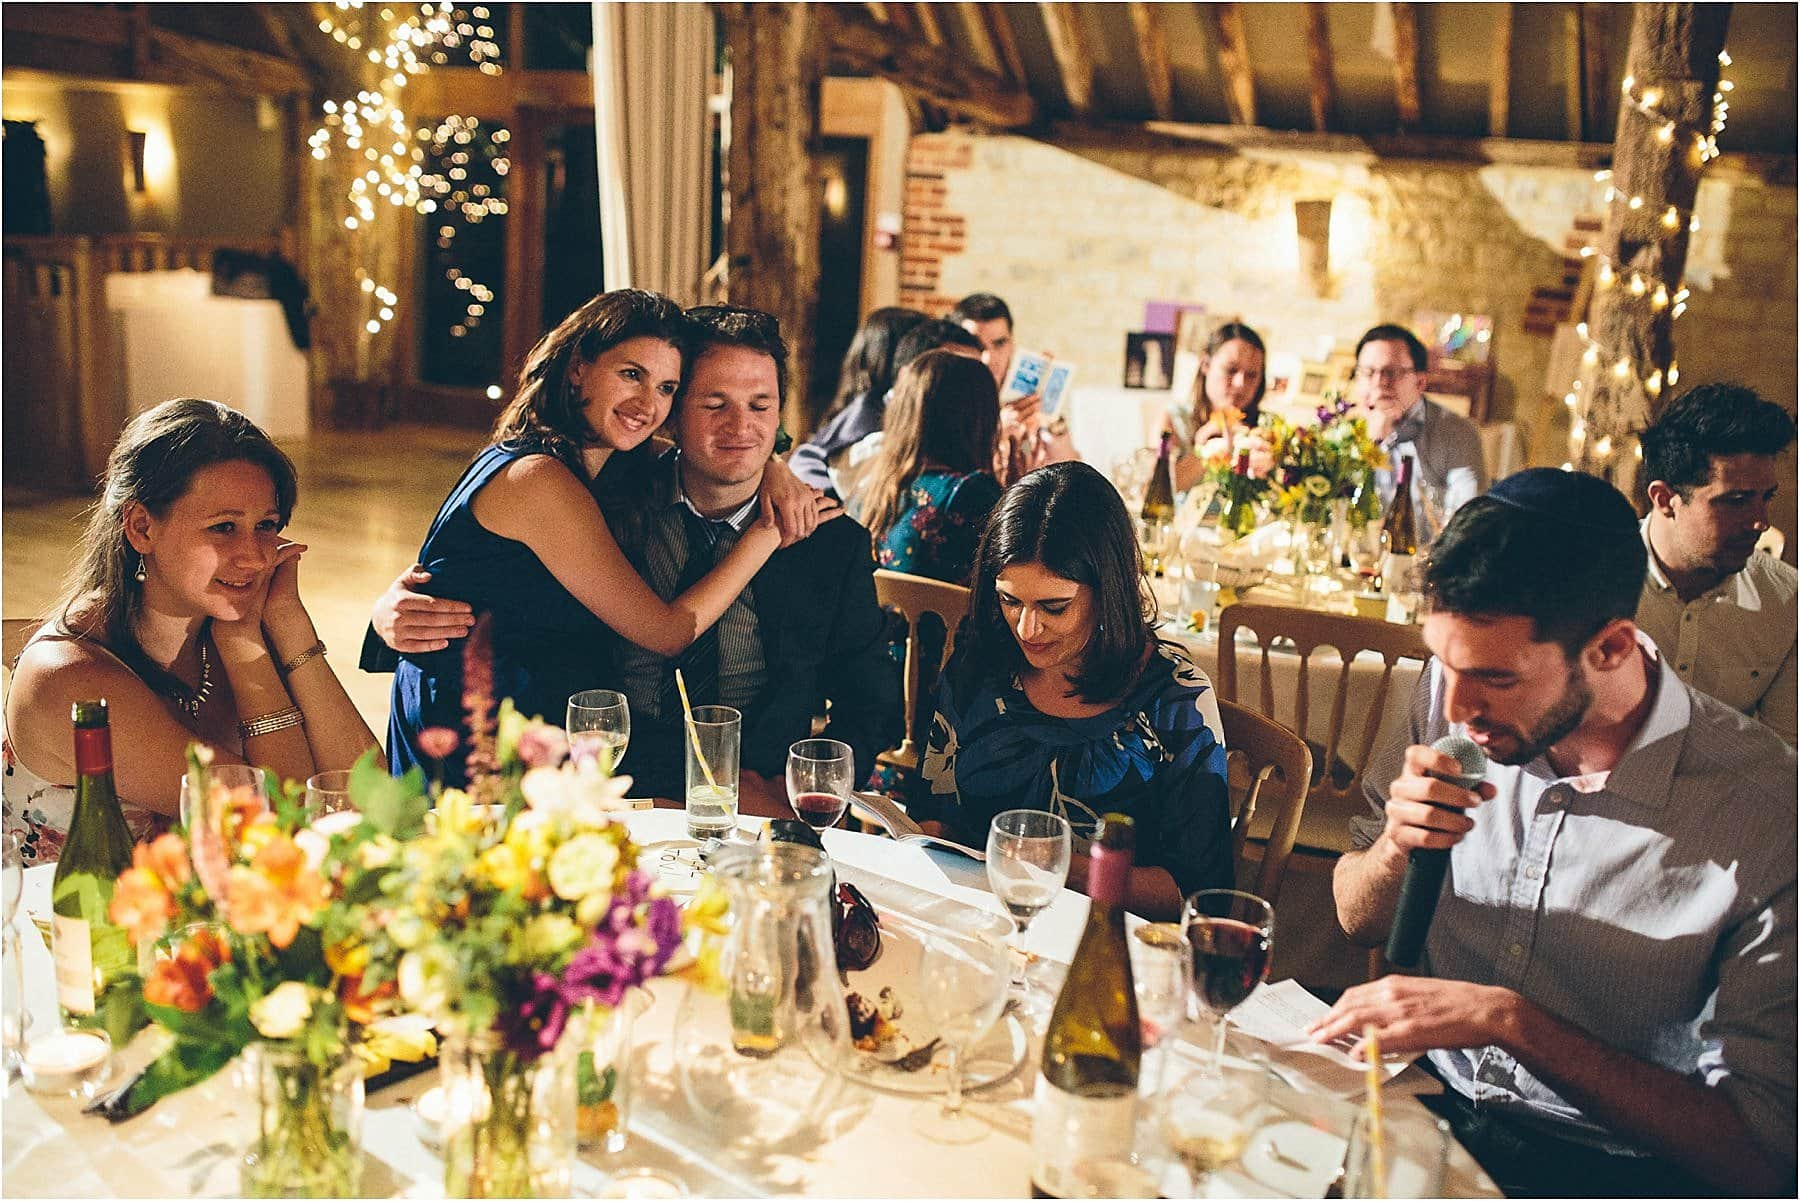 The_Barn_At_Bury_Court_Wedding_107